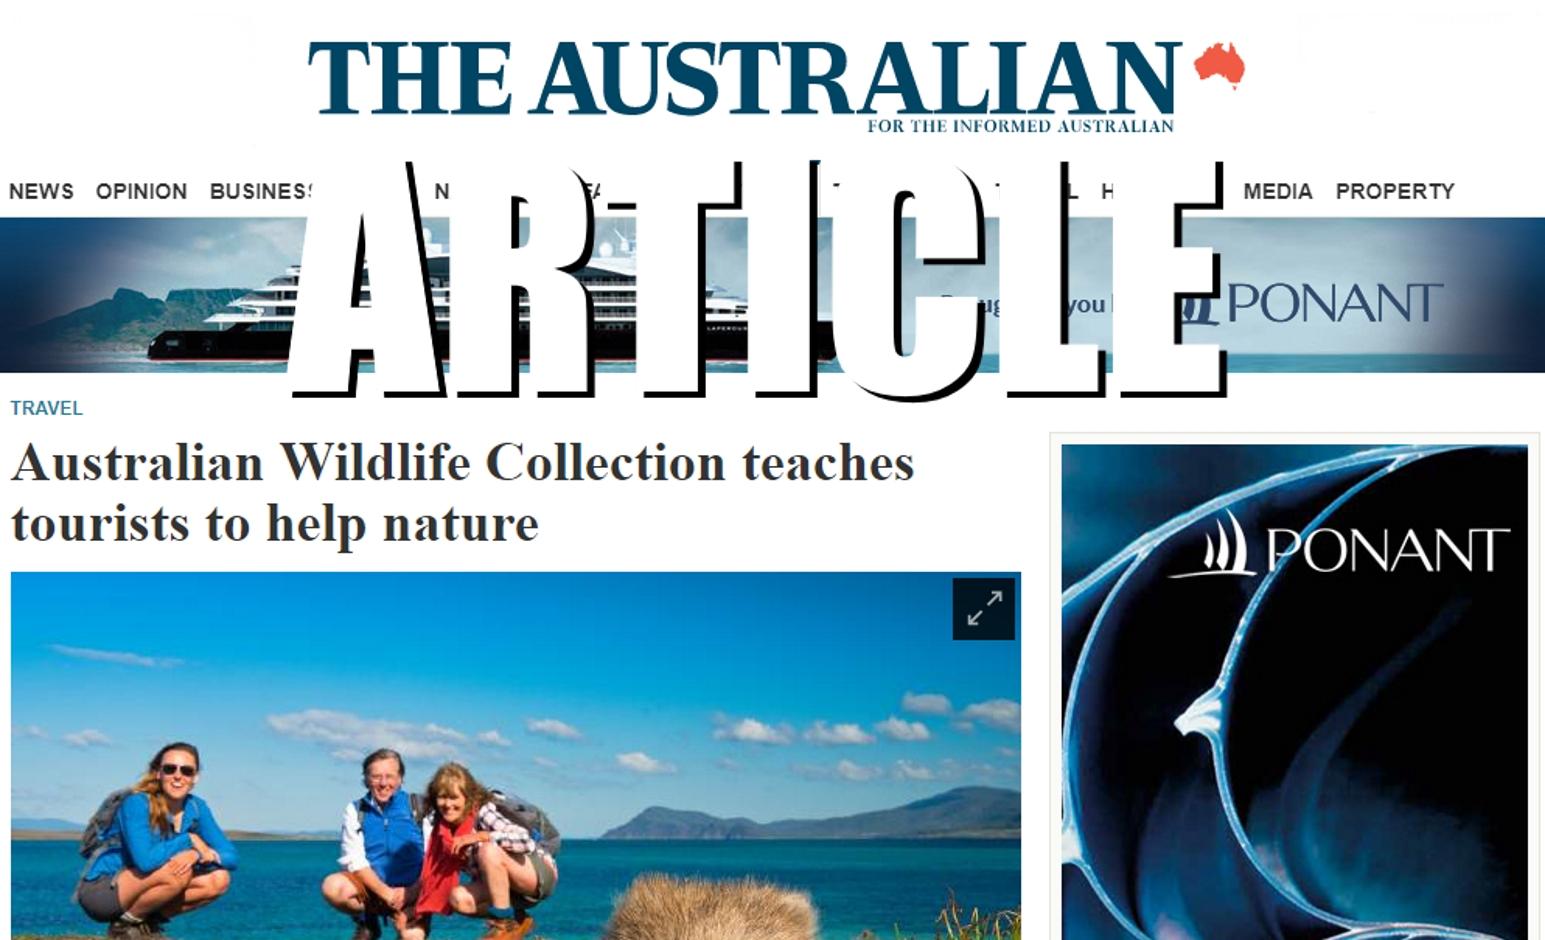 Echidna Walkabout in The Australian newspaper